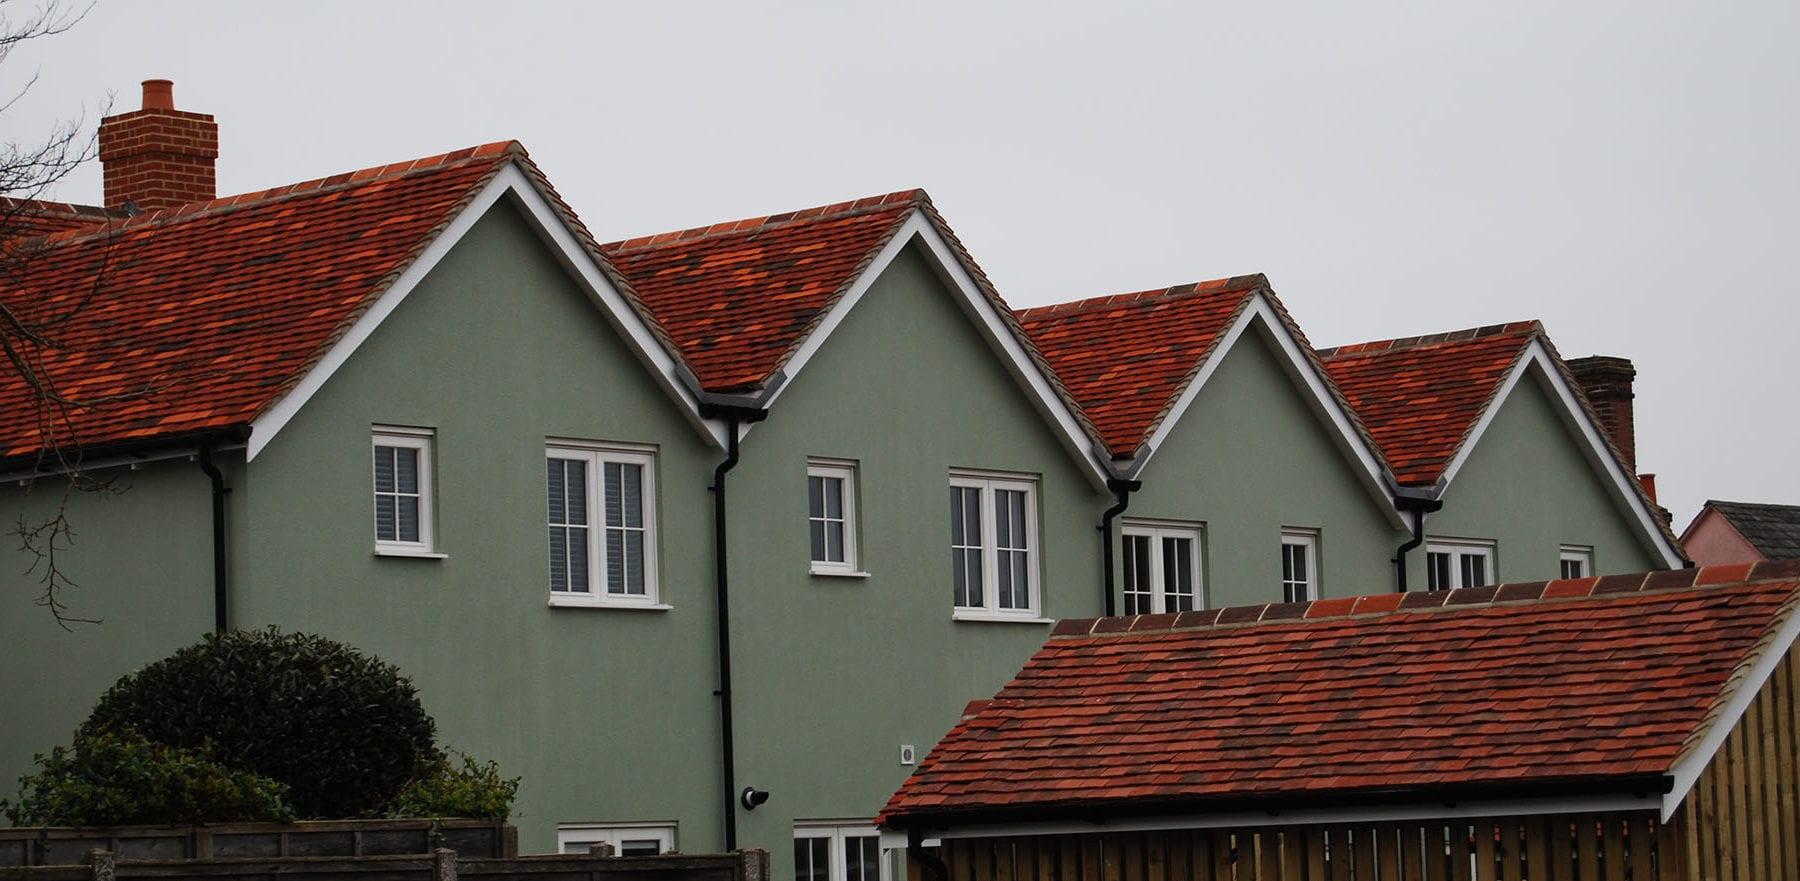 Lifestiles - Handmade Multi Clay Roof Tiles - New Street, England 4